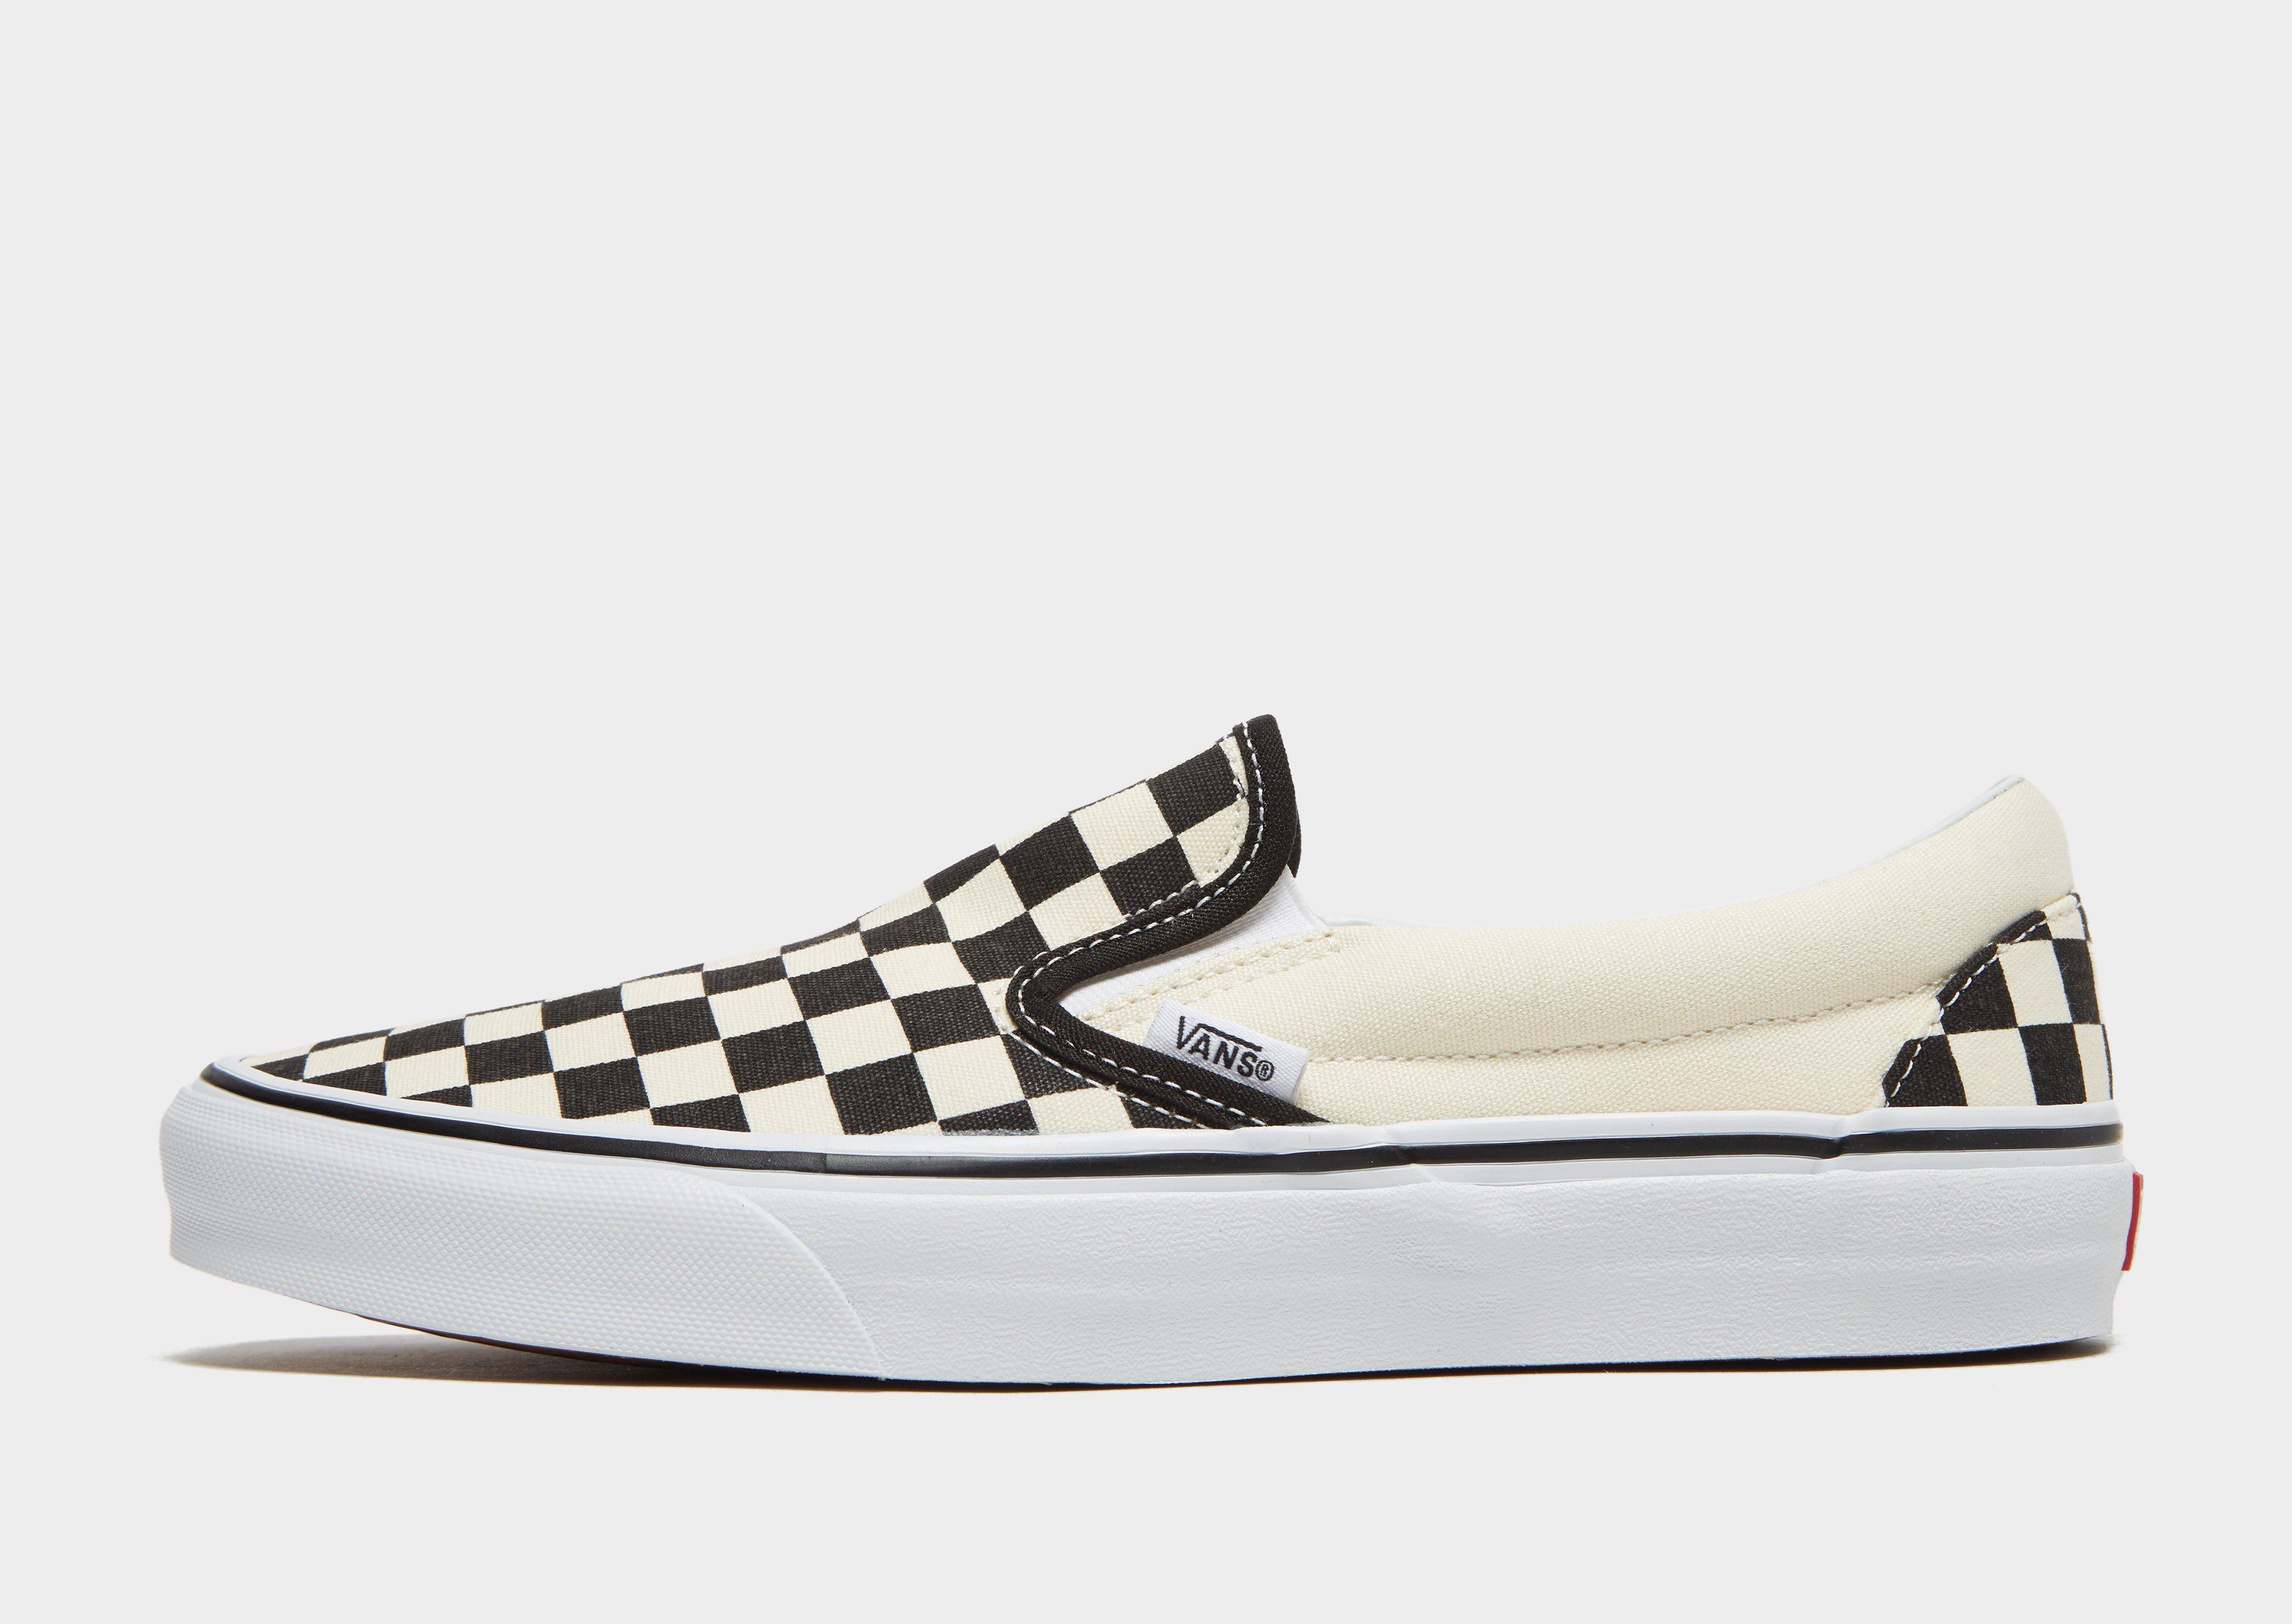 77ef1f62bdb Vans Classic Slip-On